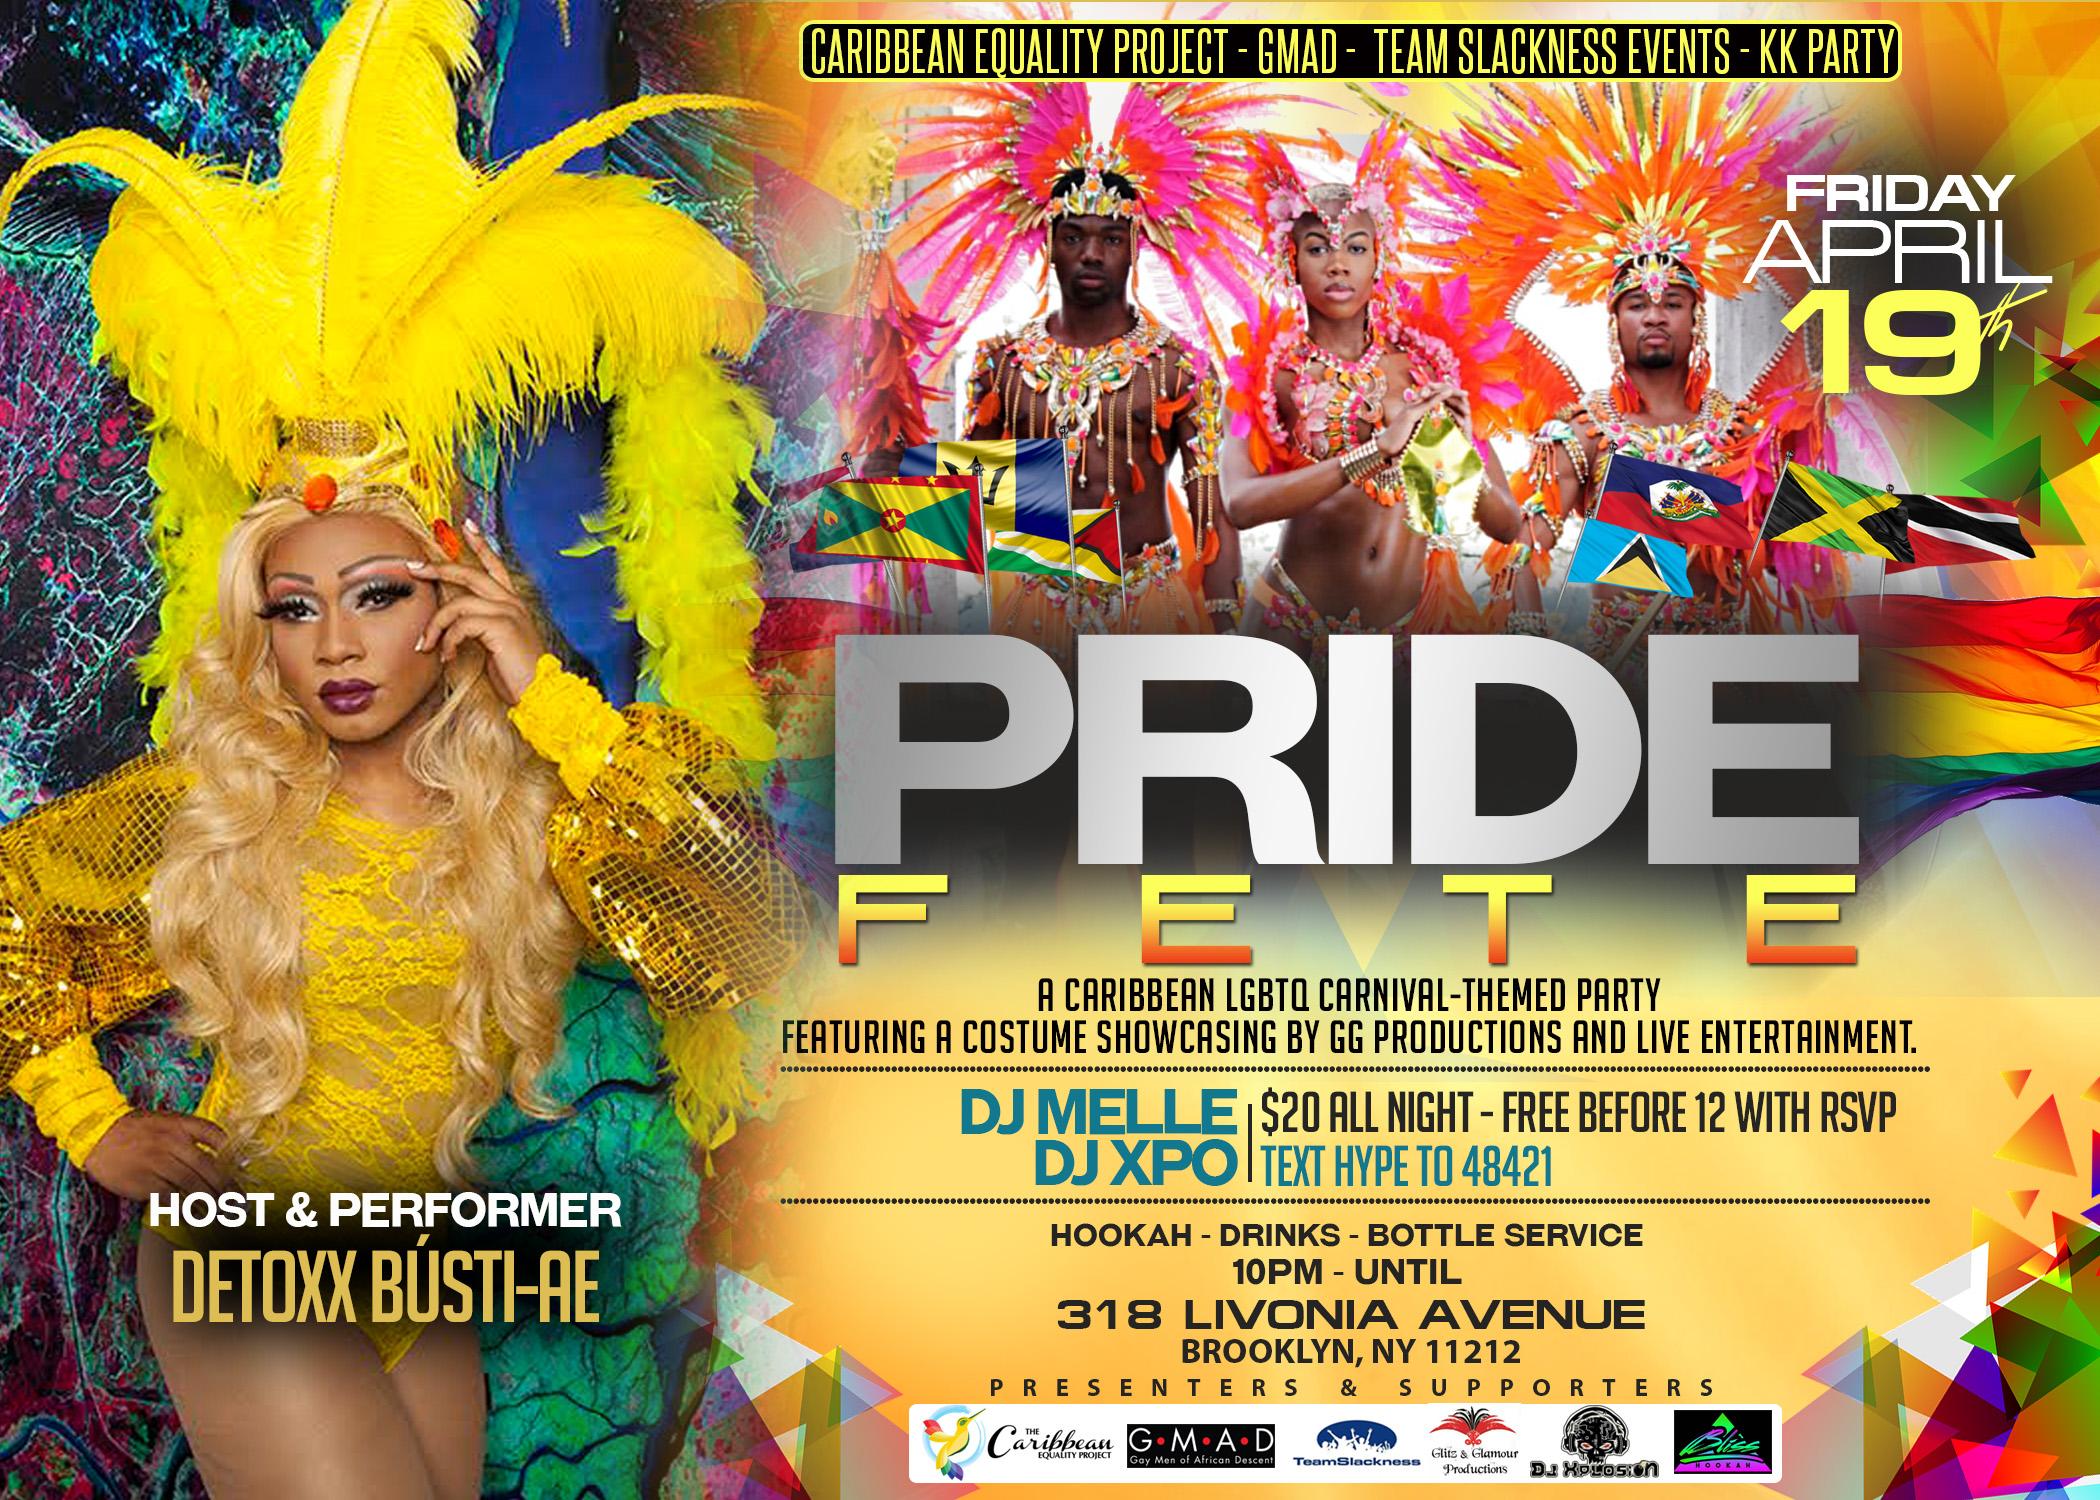 Pride Fete_FRONT_HOST_Detoxx Bústi-ae.jpg